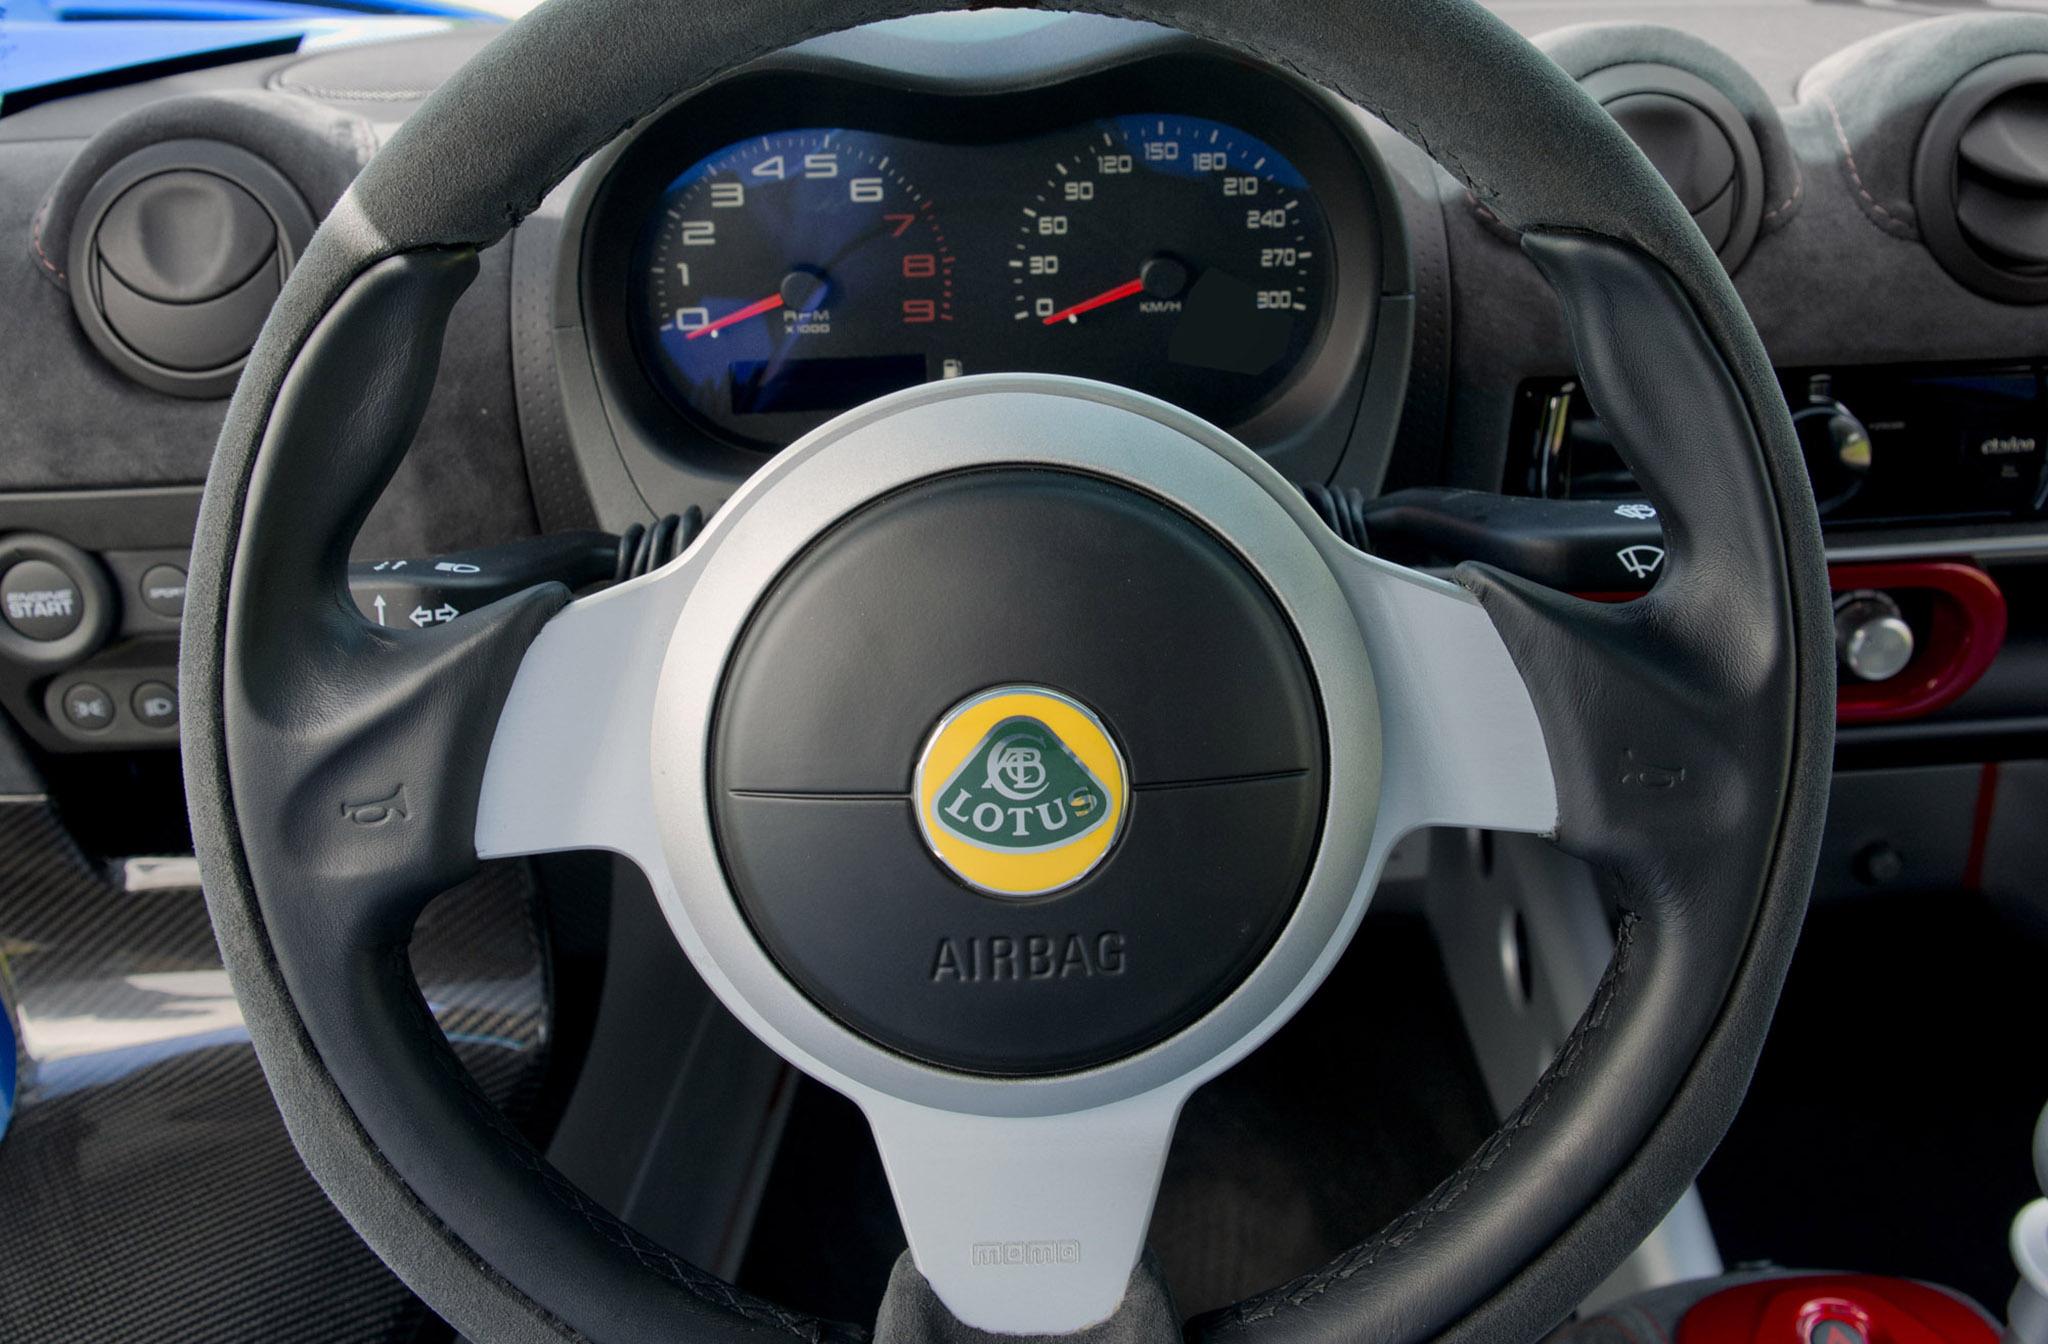 http://st.automobilemag.com/uploads/sites/11/2017/04/Exige-Cup-380-Steering-Wheel.jpg